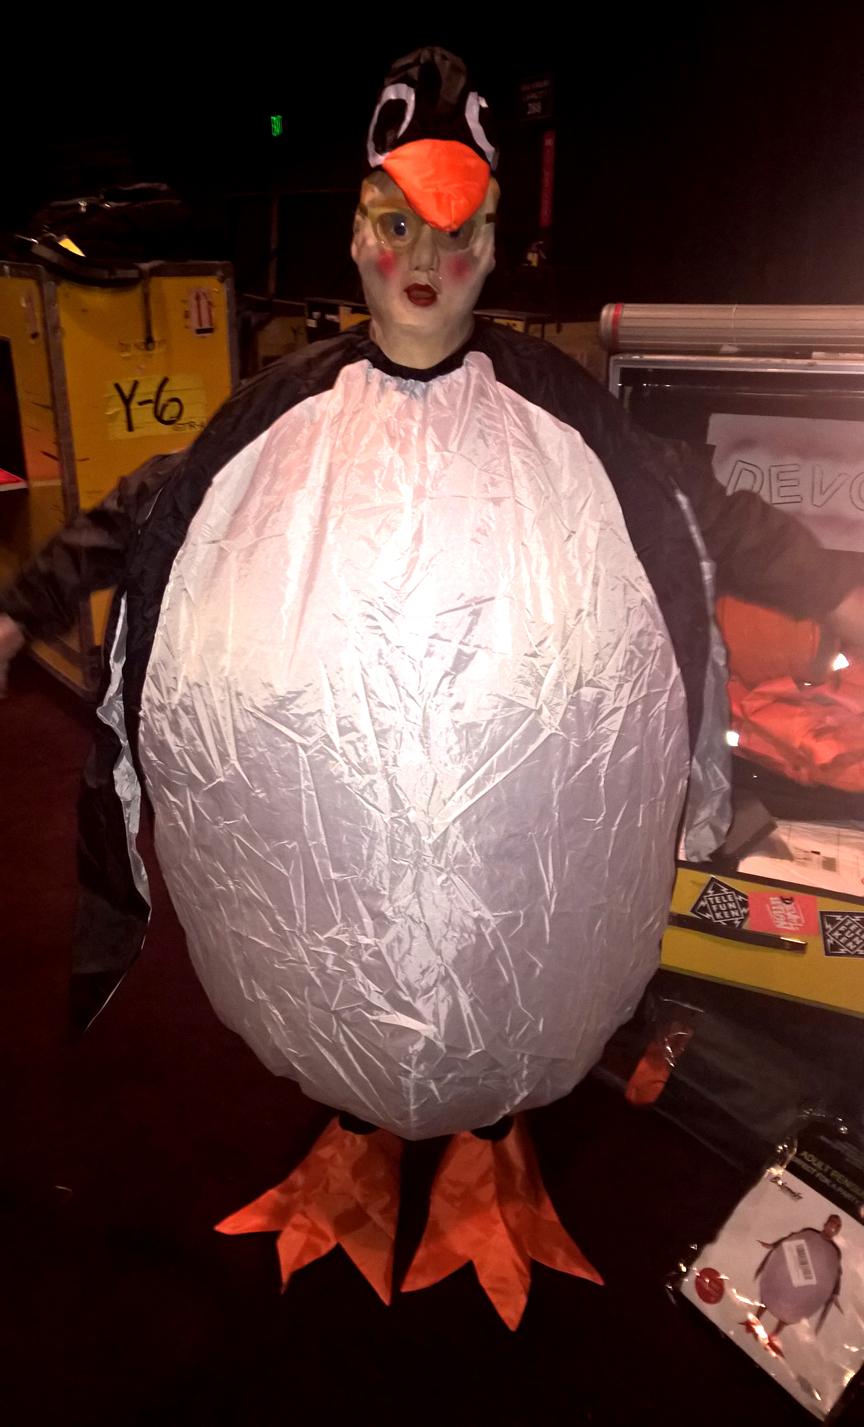 booji boy penguin costume clubdevo. Black Bedroom Furniture Sets. Home Design Ideas